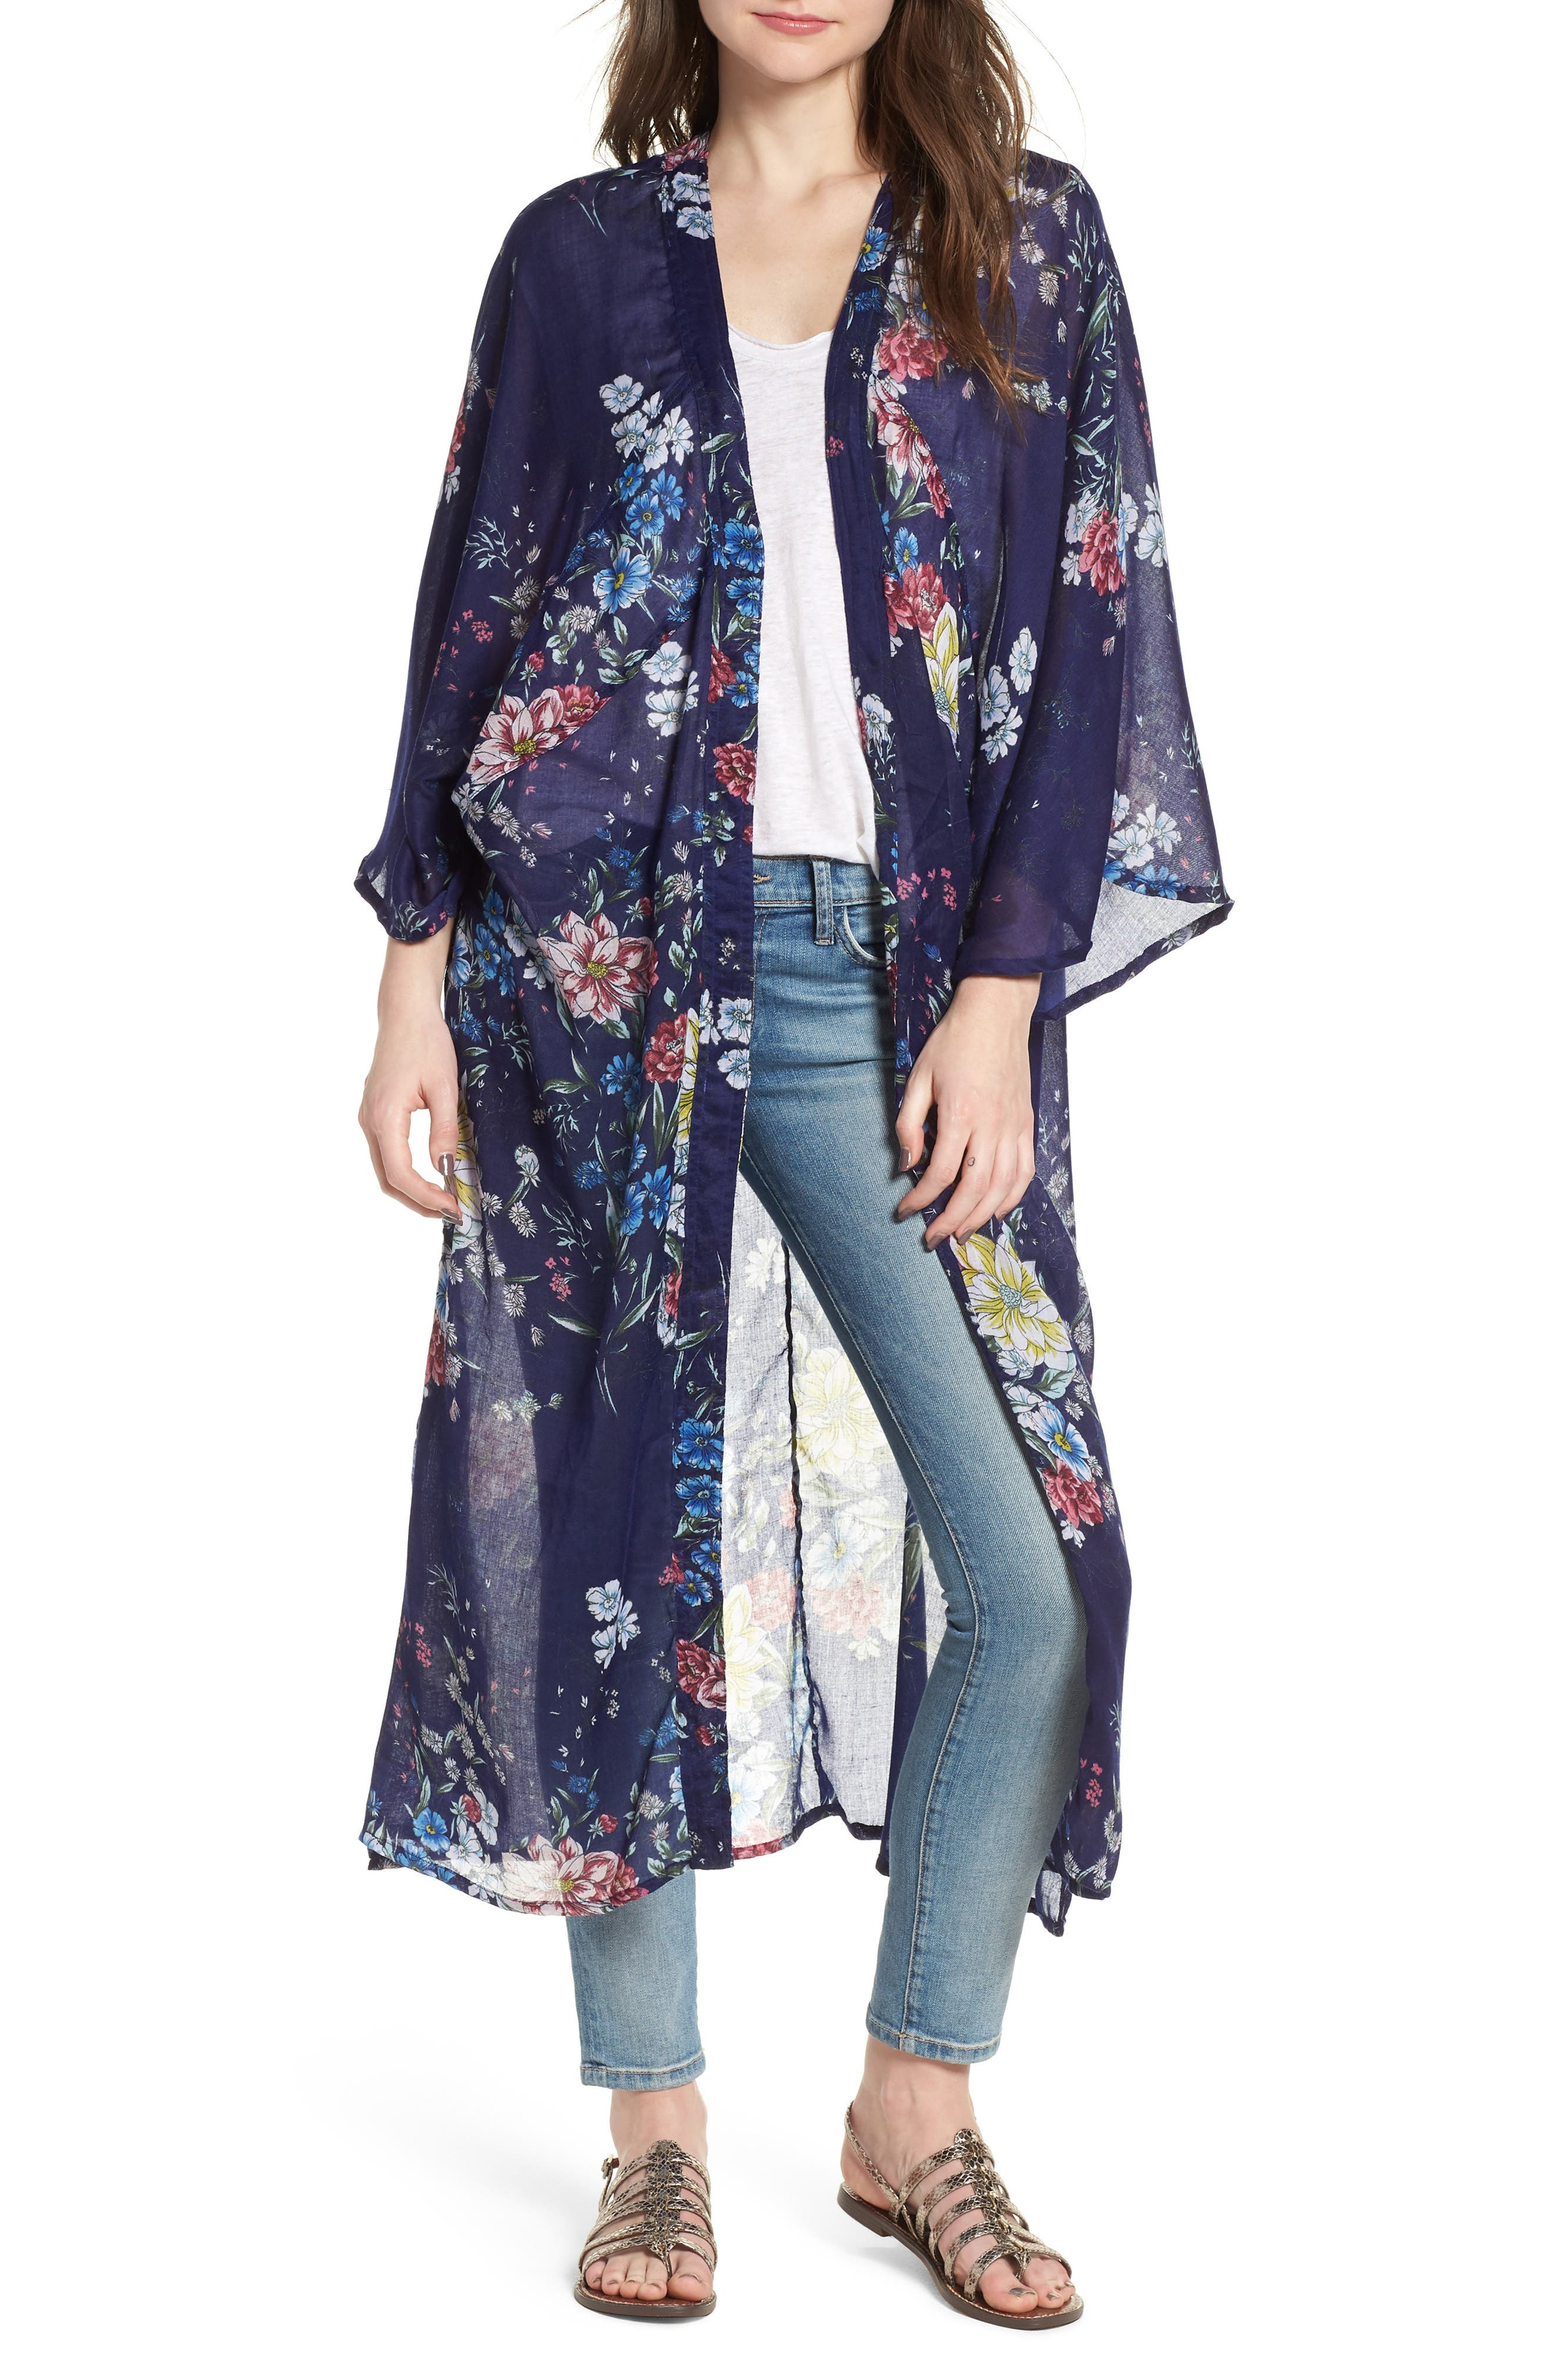 STEVE MADDEN Floral Kimono Duster, Main, color, 410